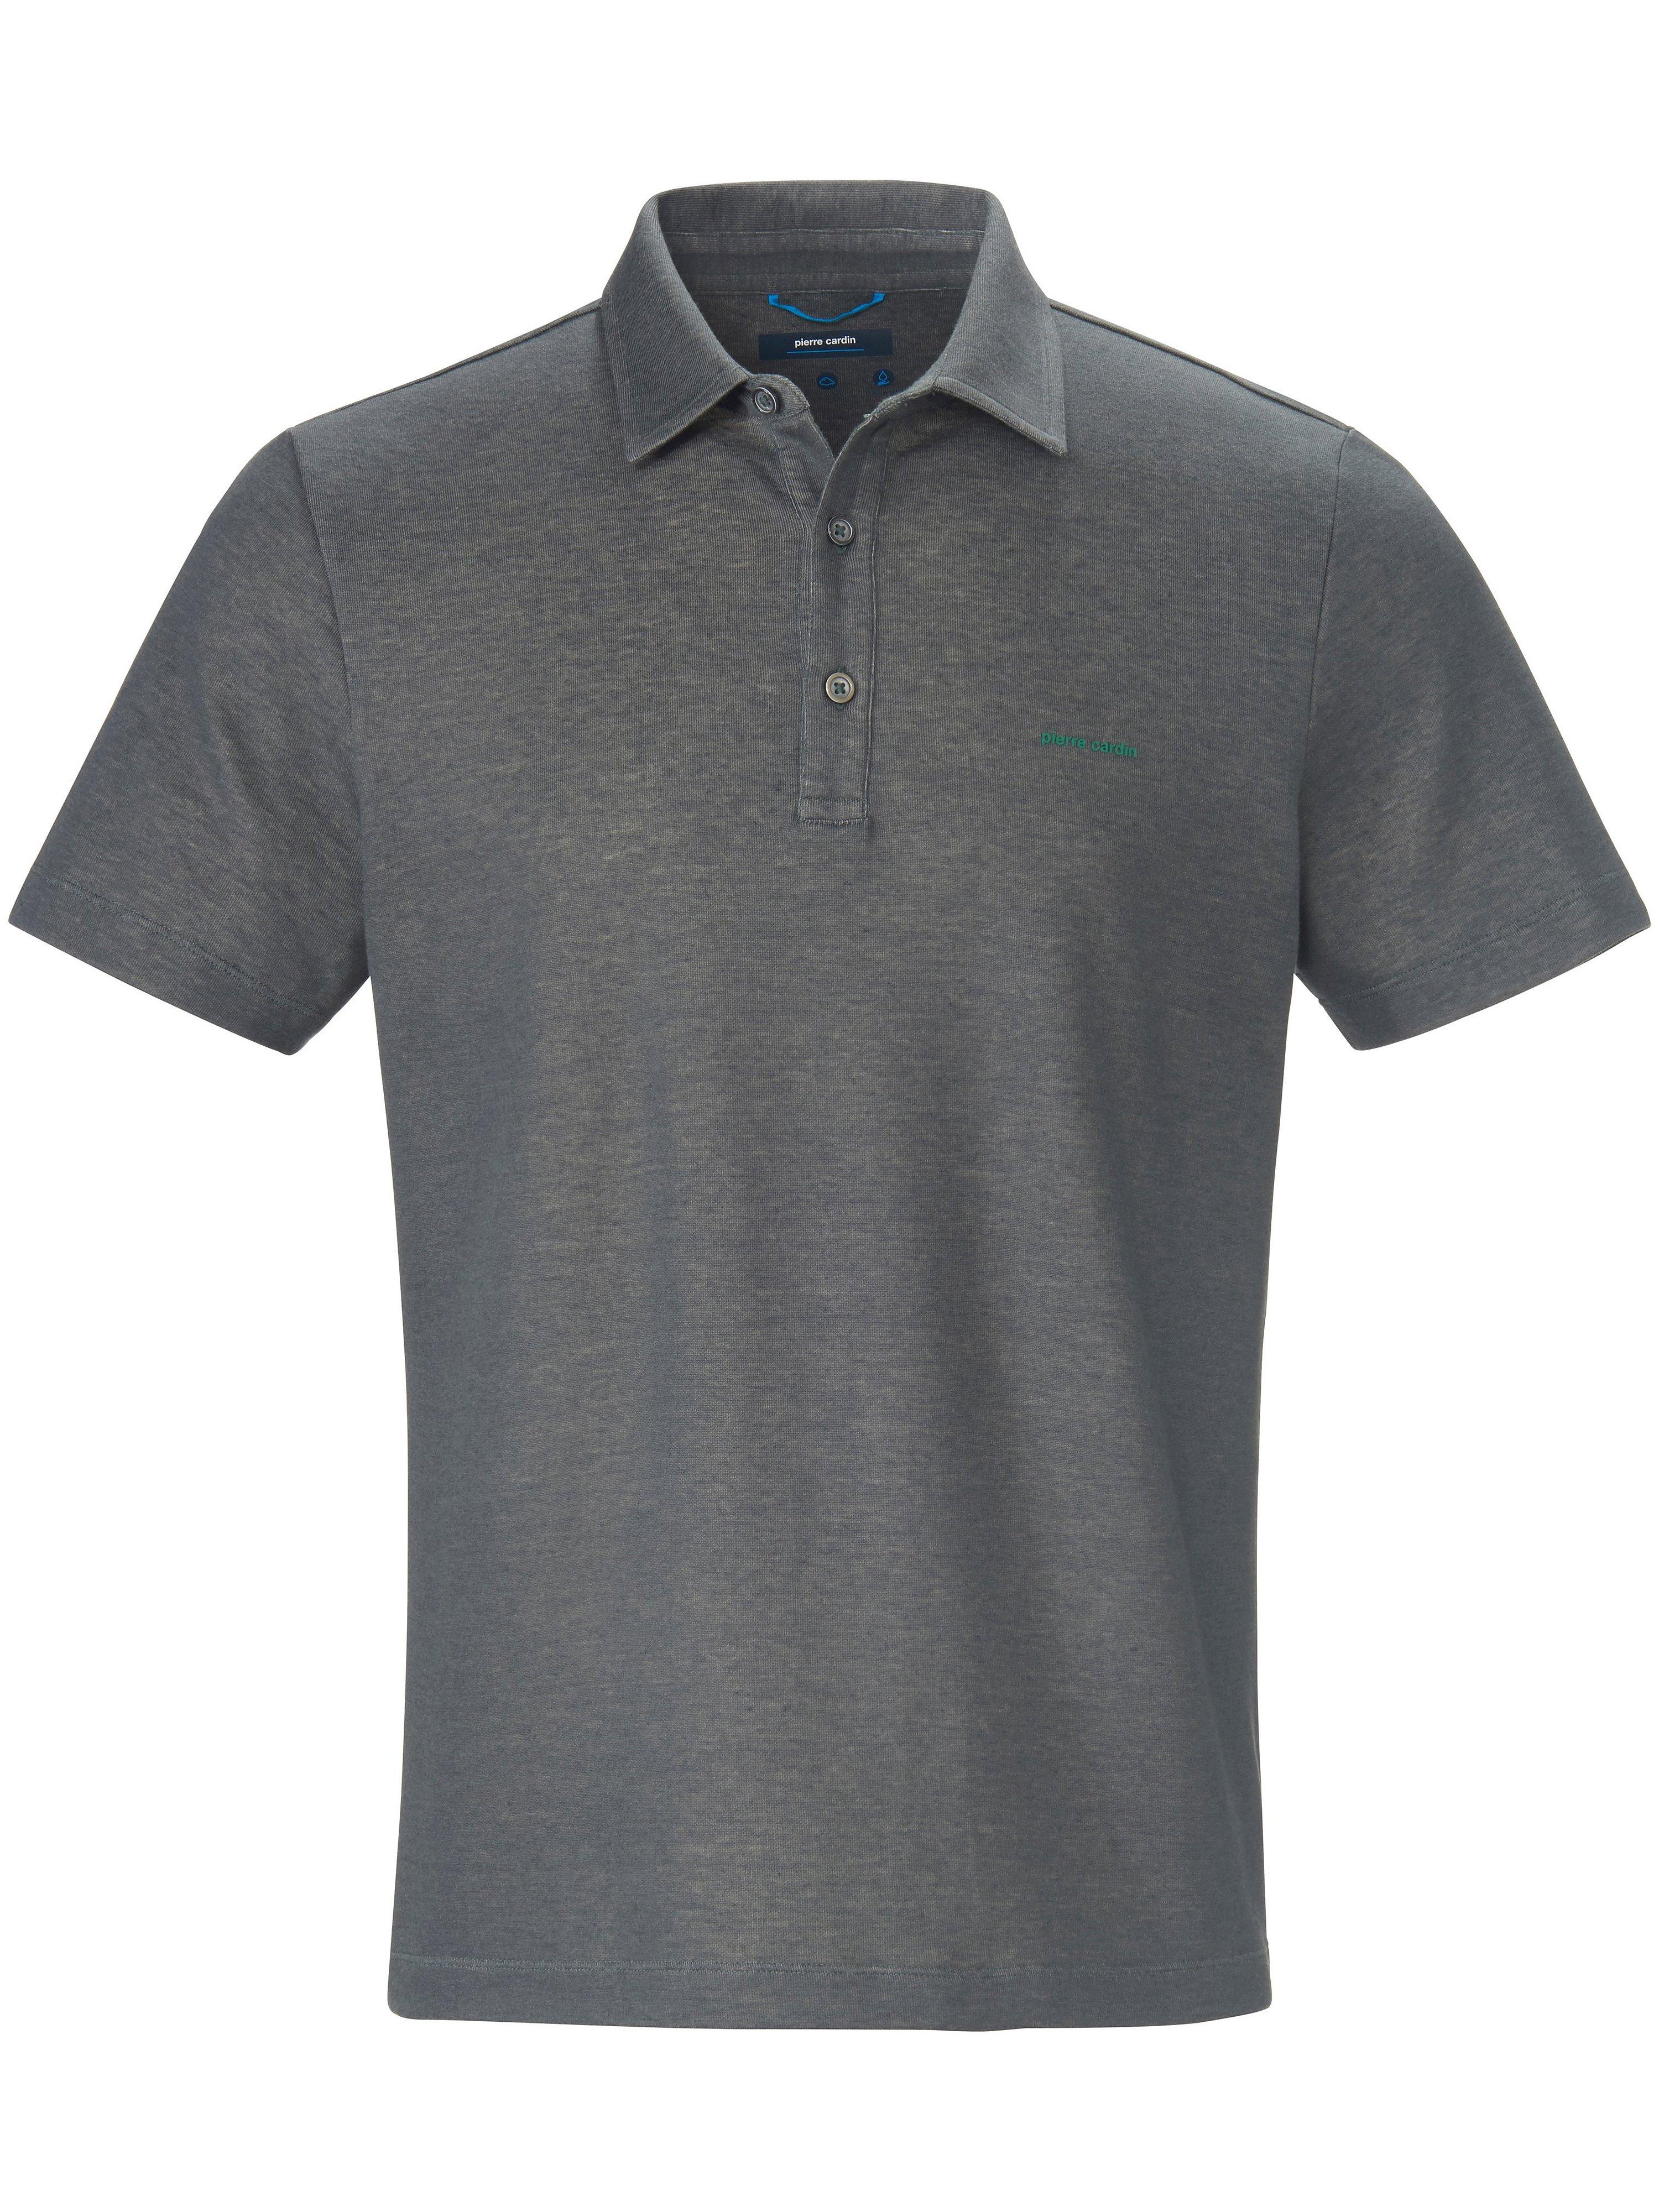 Polo shirt Pierre Cardin green